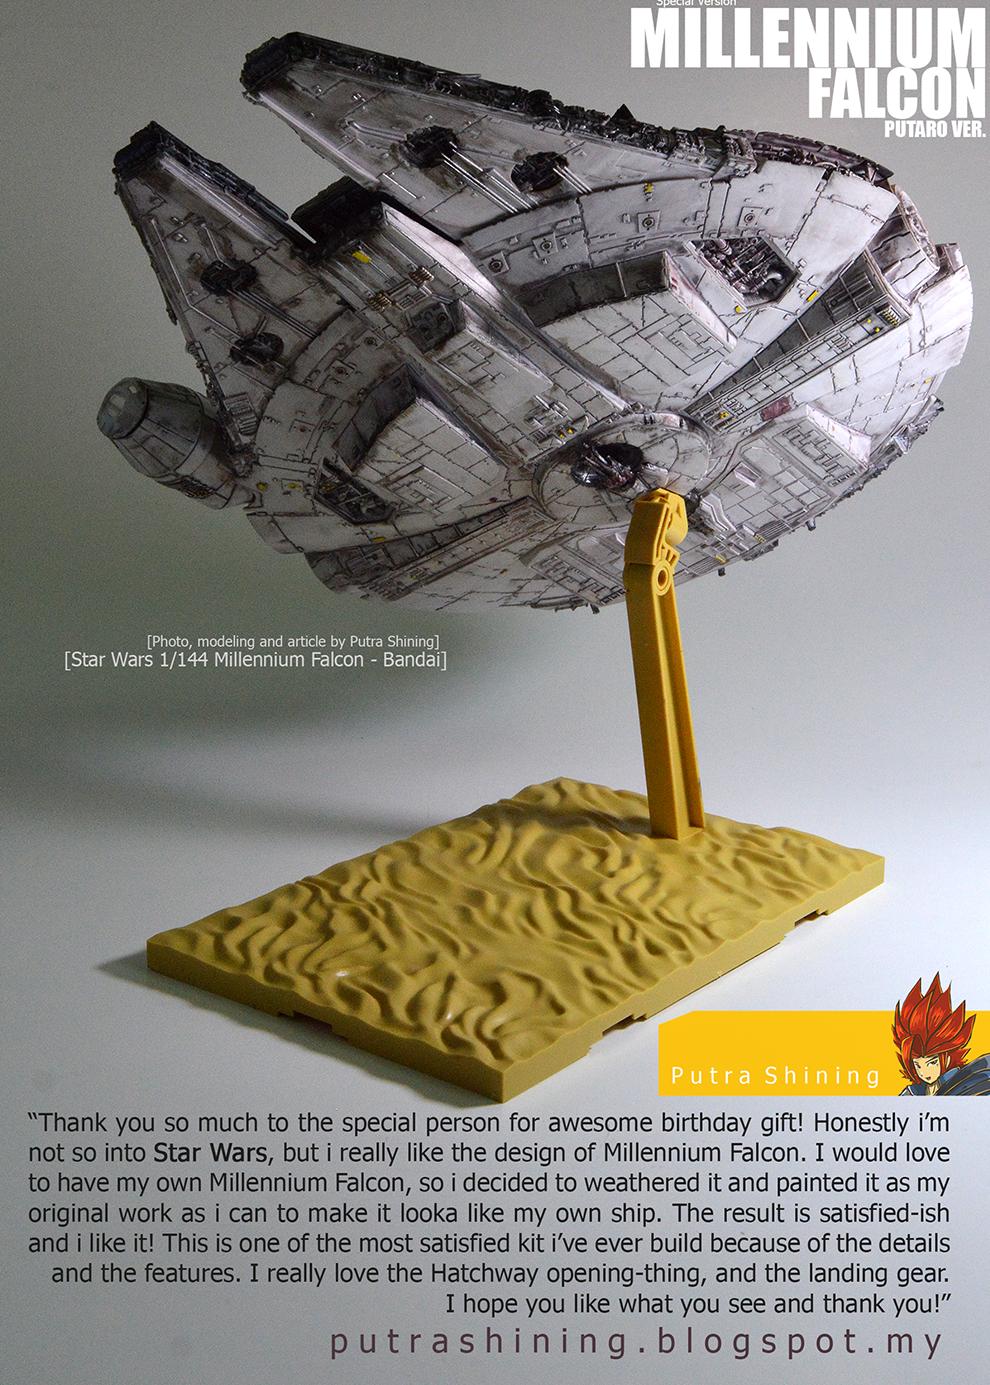 Bandai Star Wars: 1/144 Millennium Falcon Custom Putaro Ver. by Putra Shining